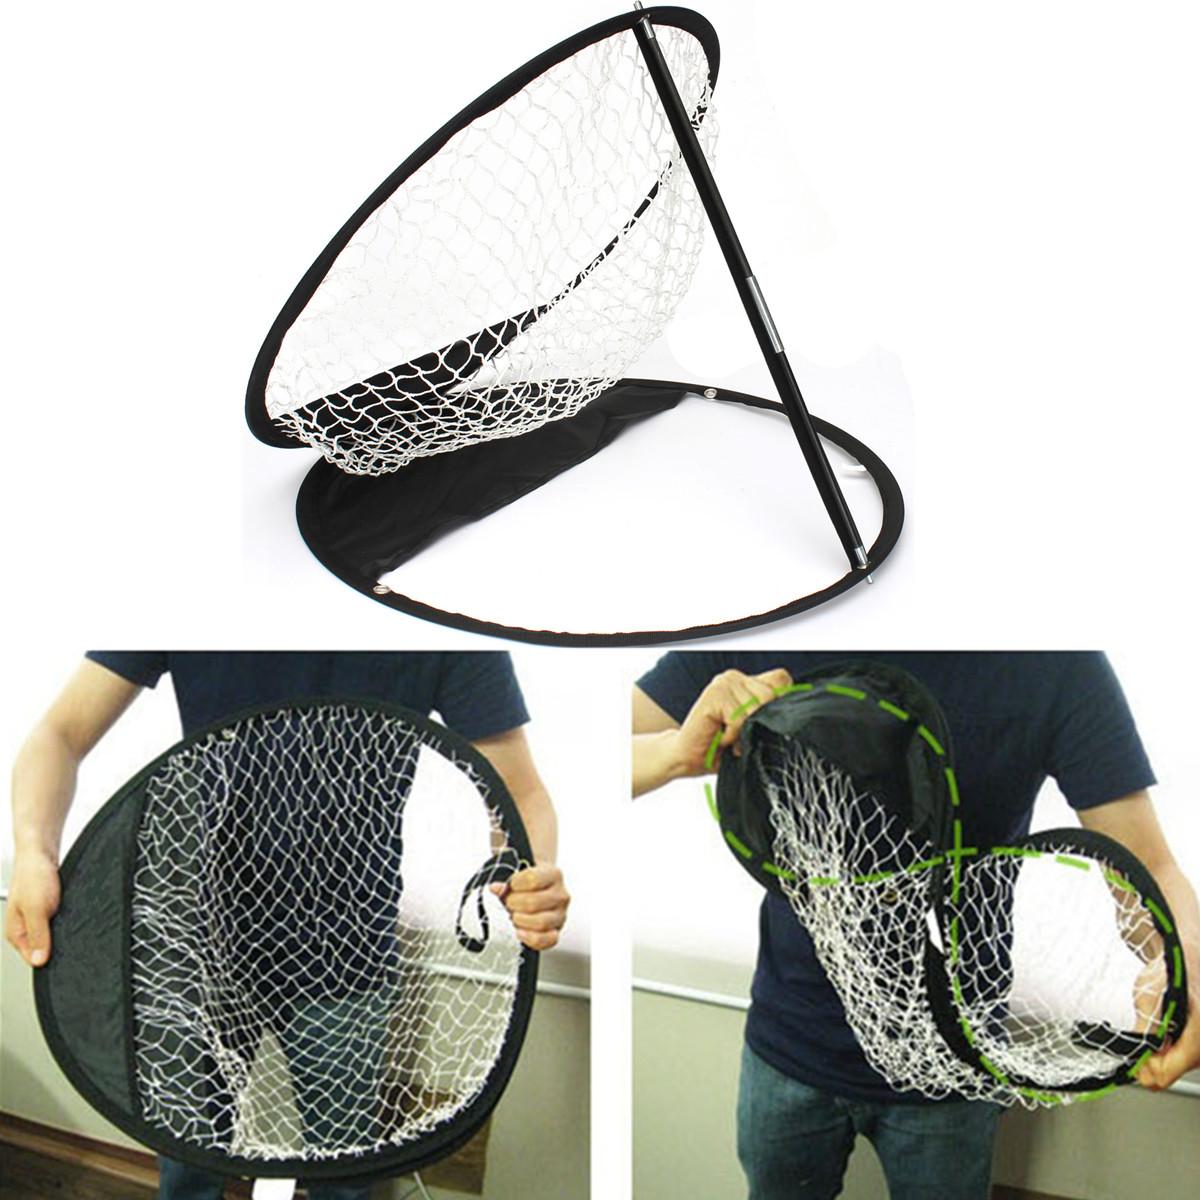 Training Chipping Net Target Net Outdoor Indoor Aid (Intl) Lazada PH #8C6B3F